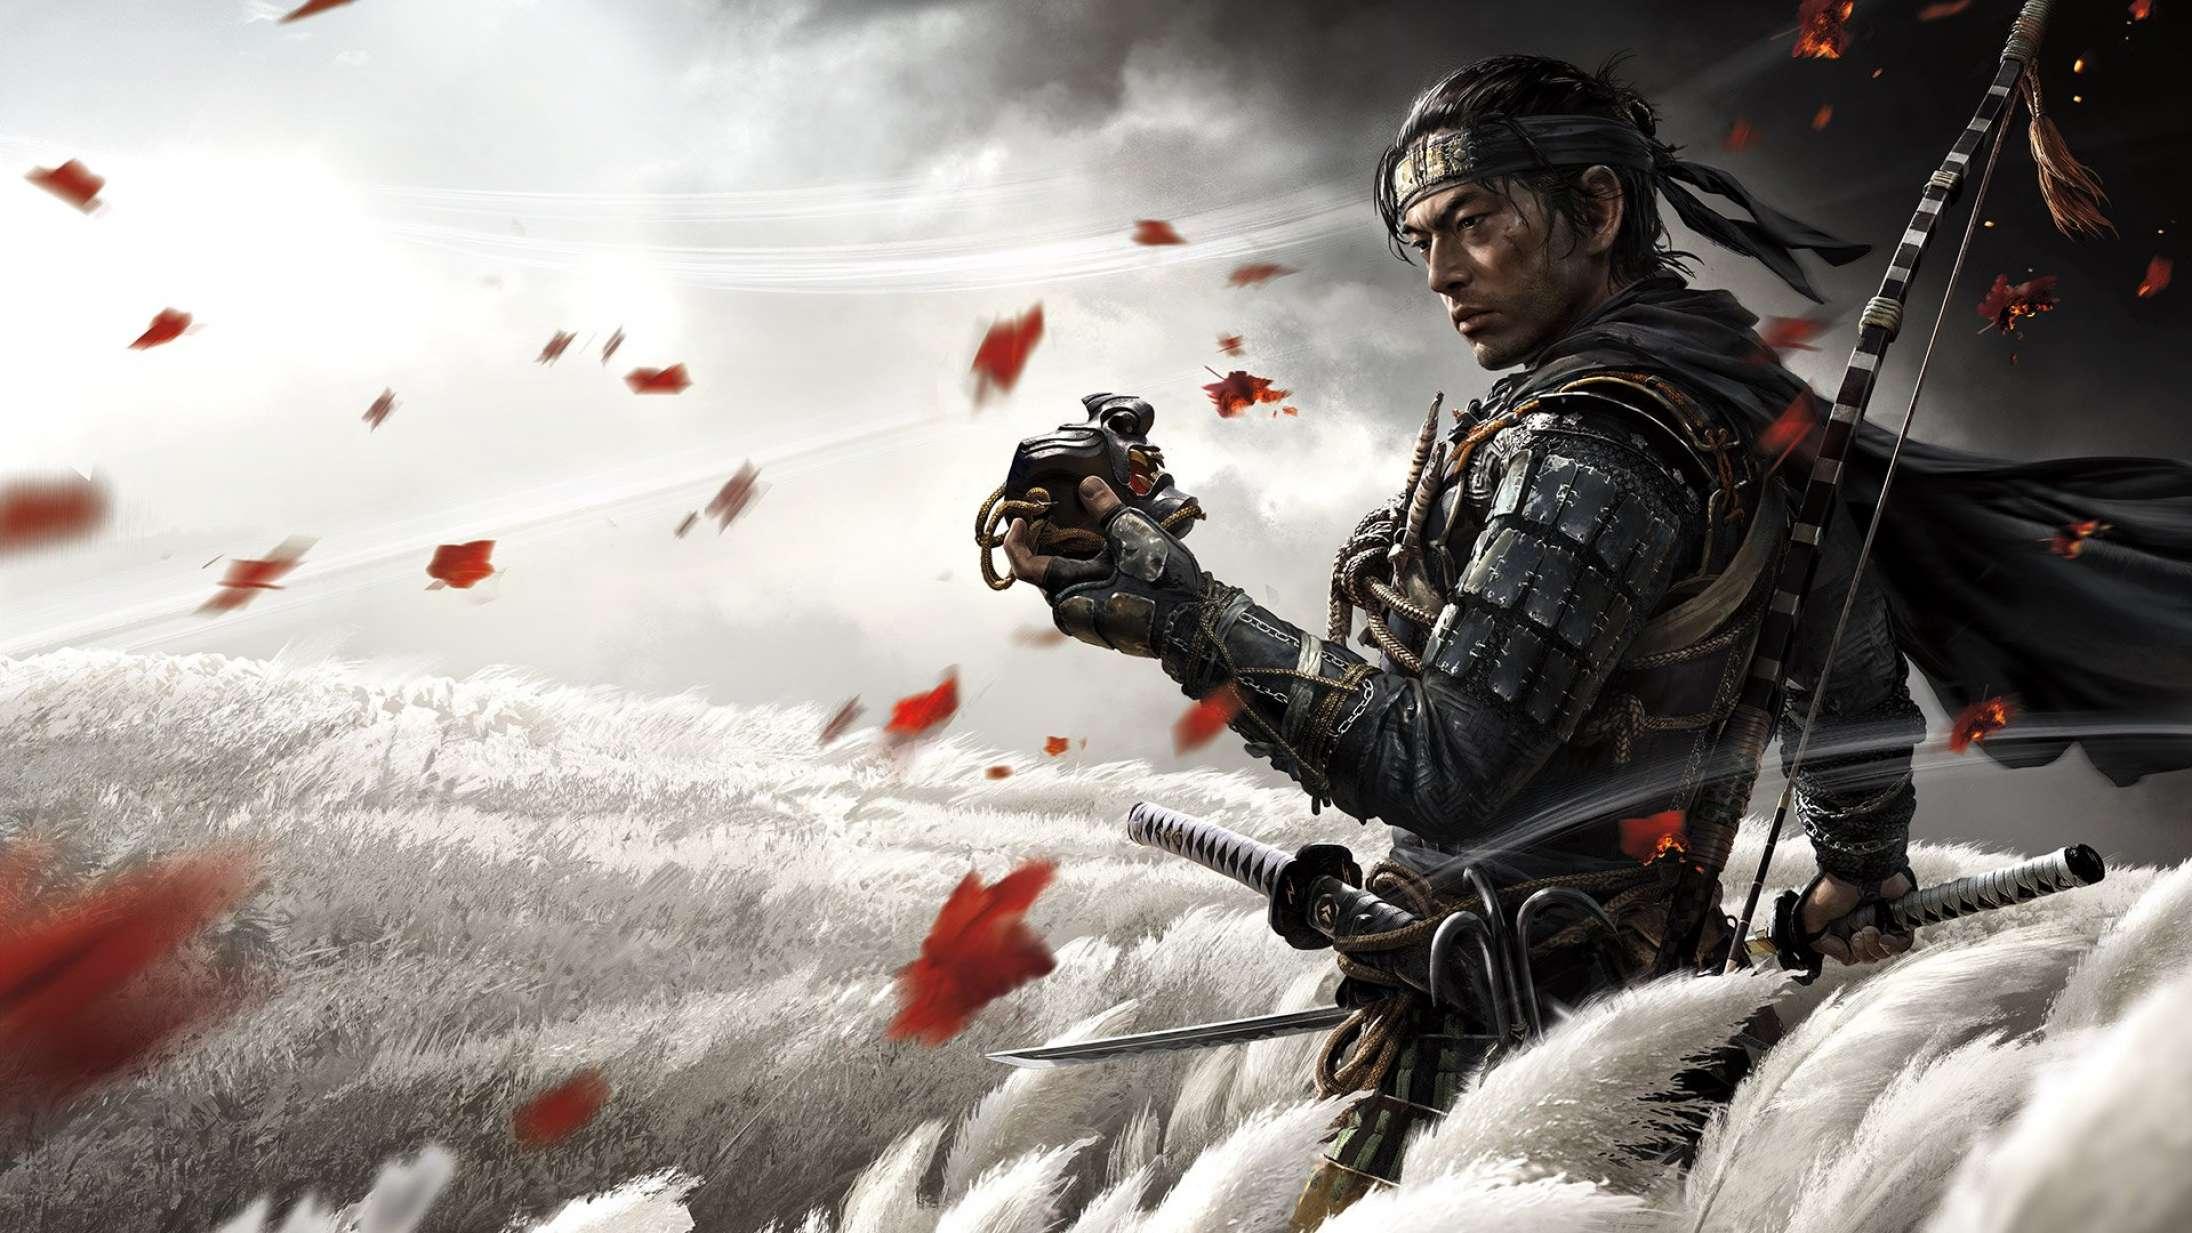 PlayStations samurai-hit 'Ghost of Tsushima' skal filmatiseres af 'John Wick'-instruktør